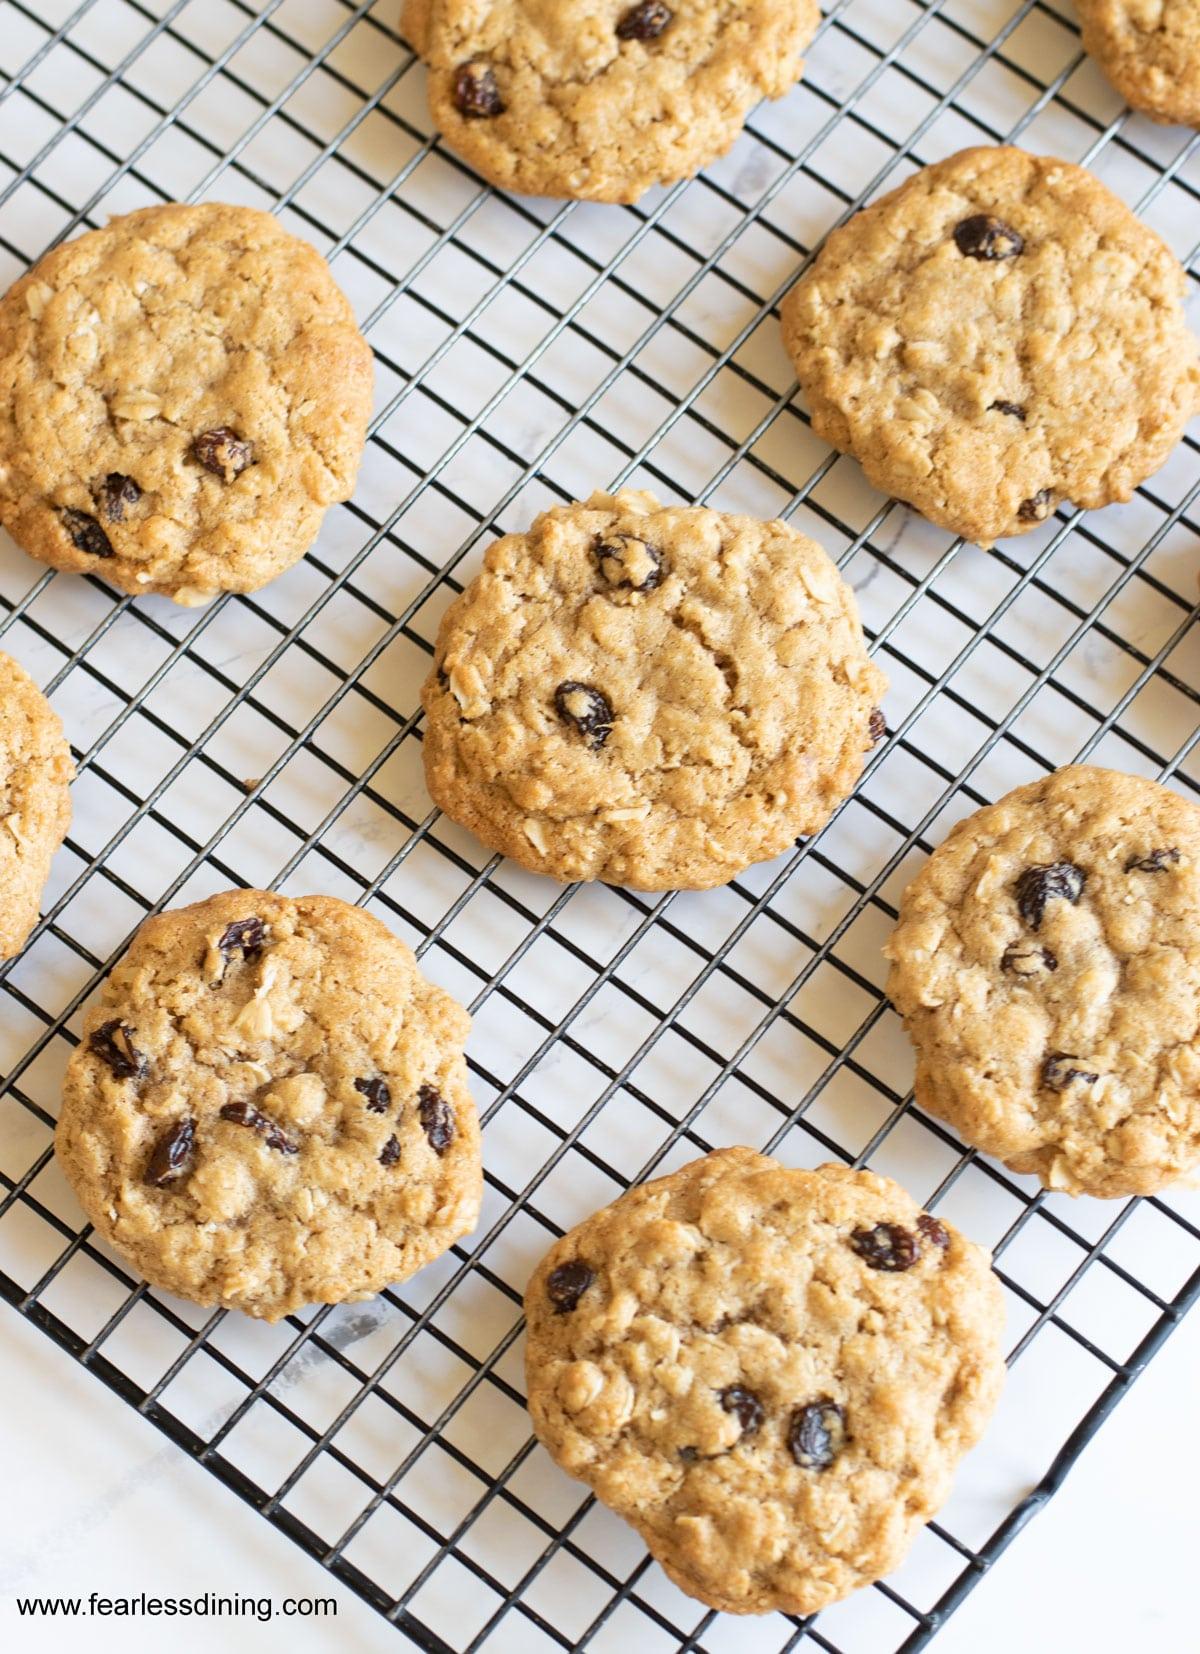 oatmeal raisin cookies on a cooling rack